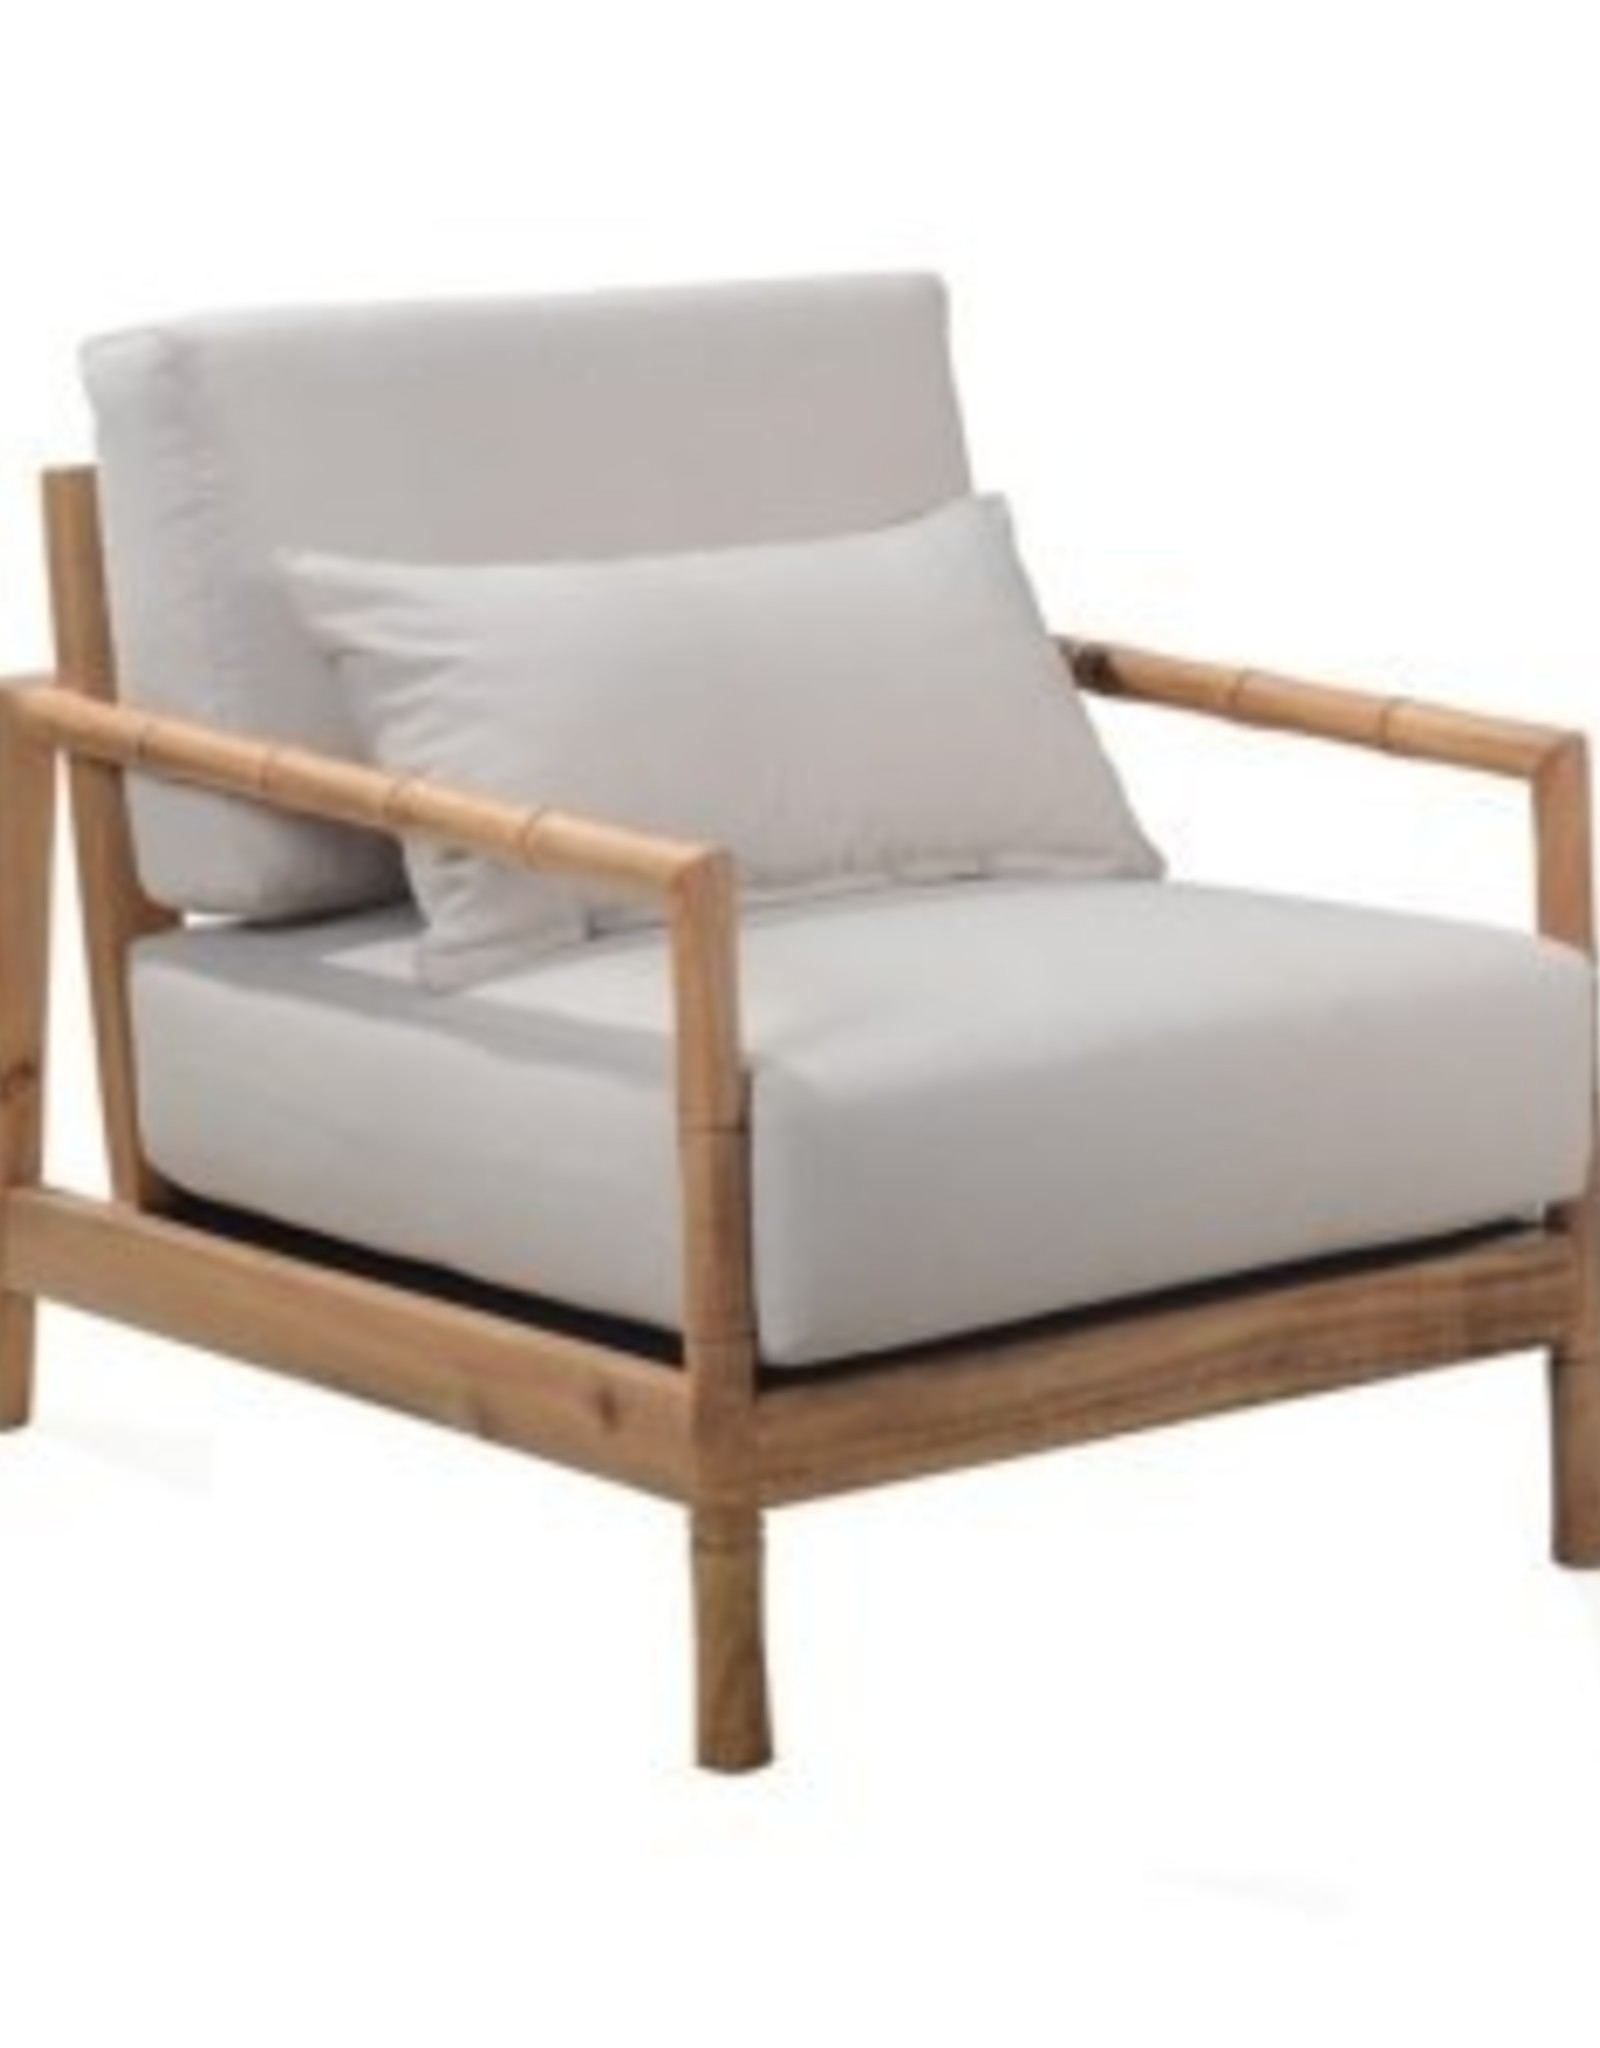 Bamboo loung Chair